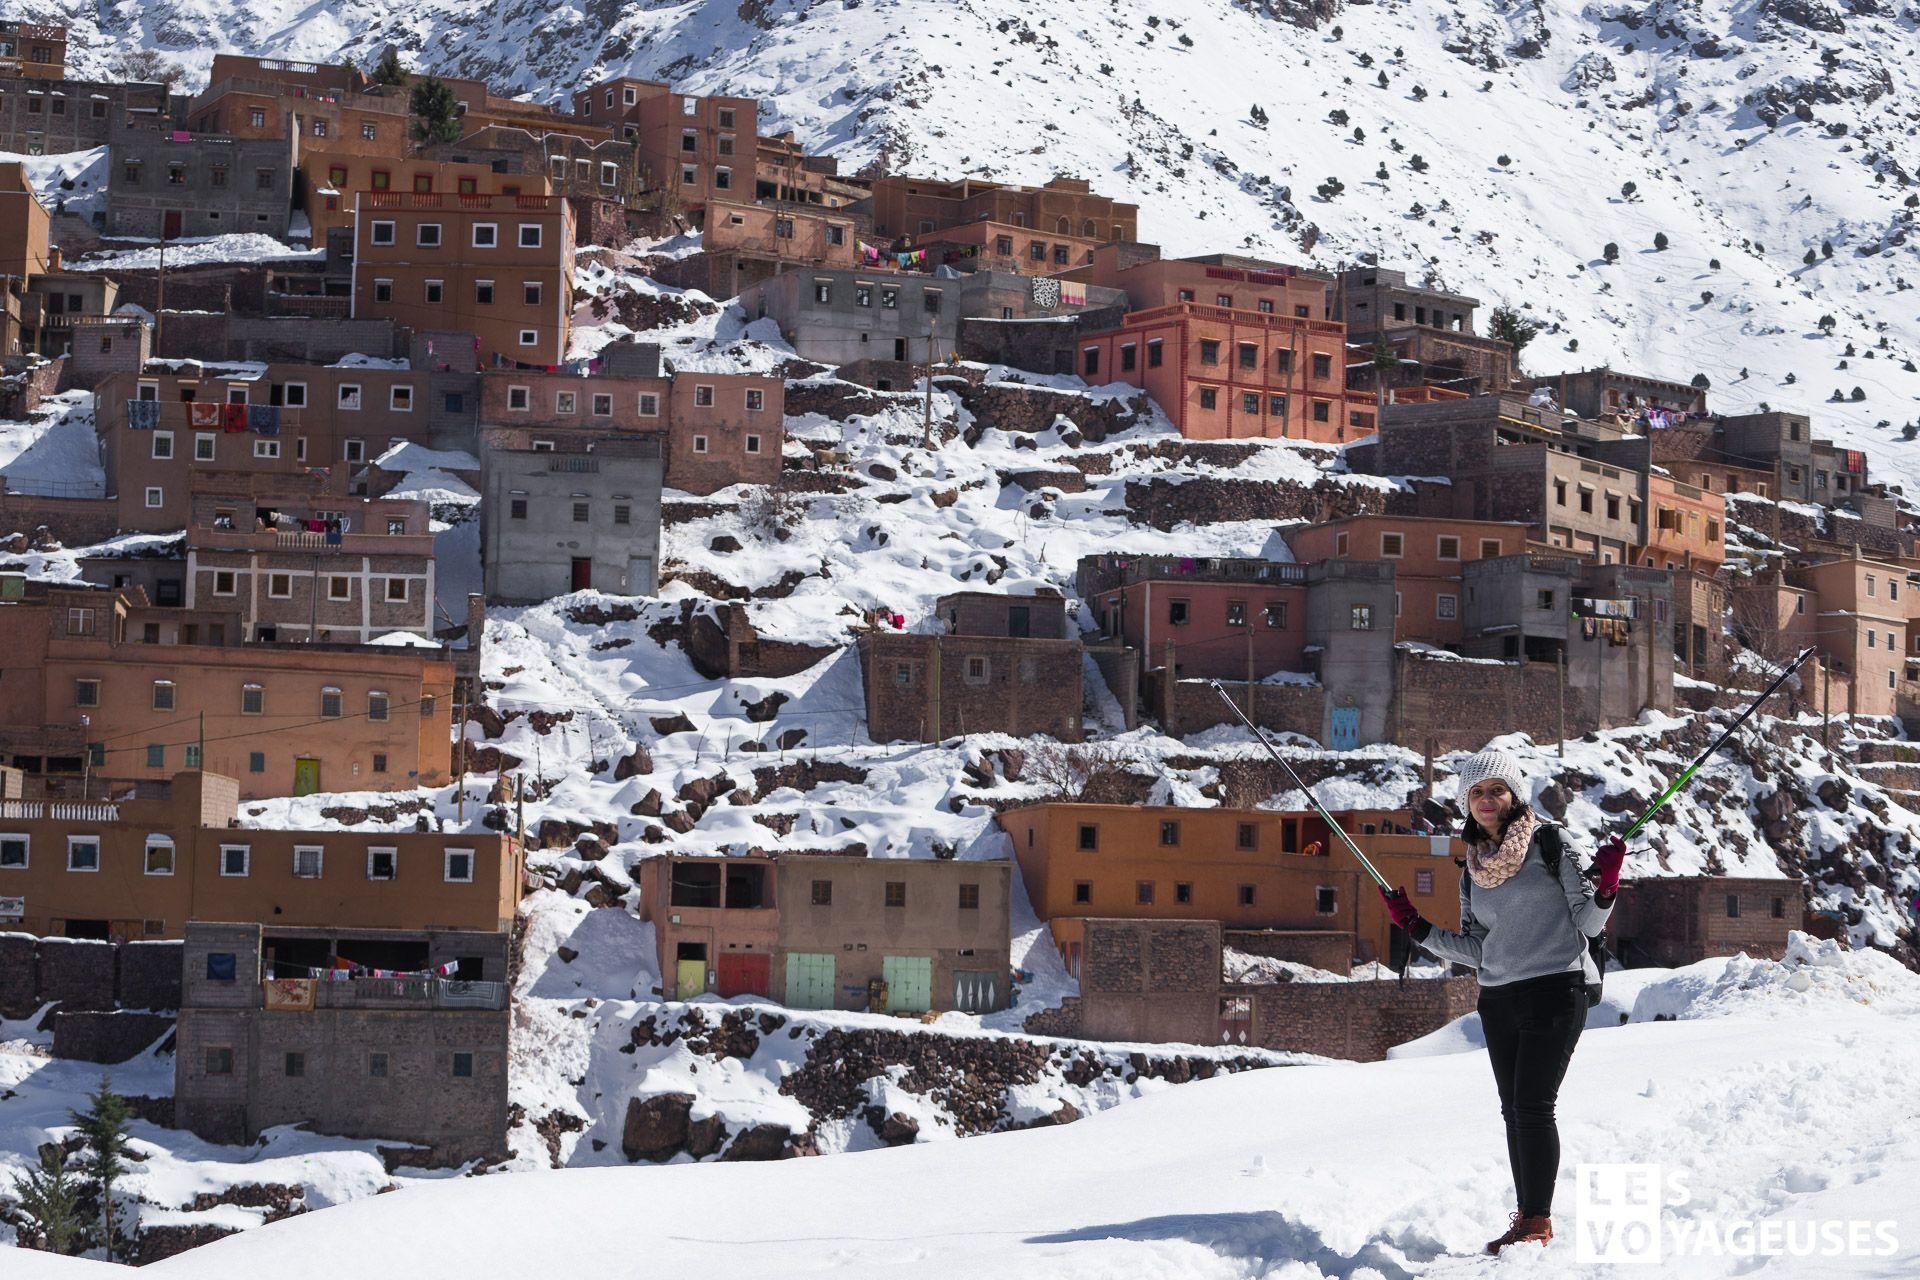 Les-voyageuses-maroc-imlil-hiver-09994